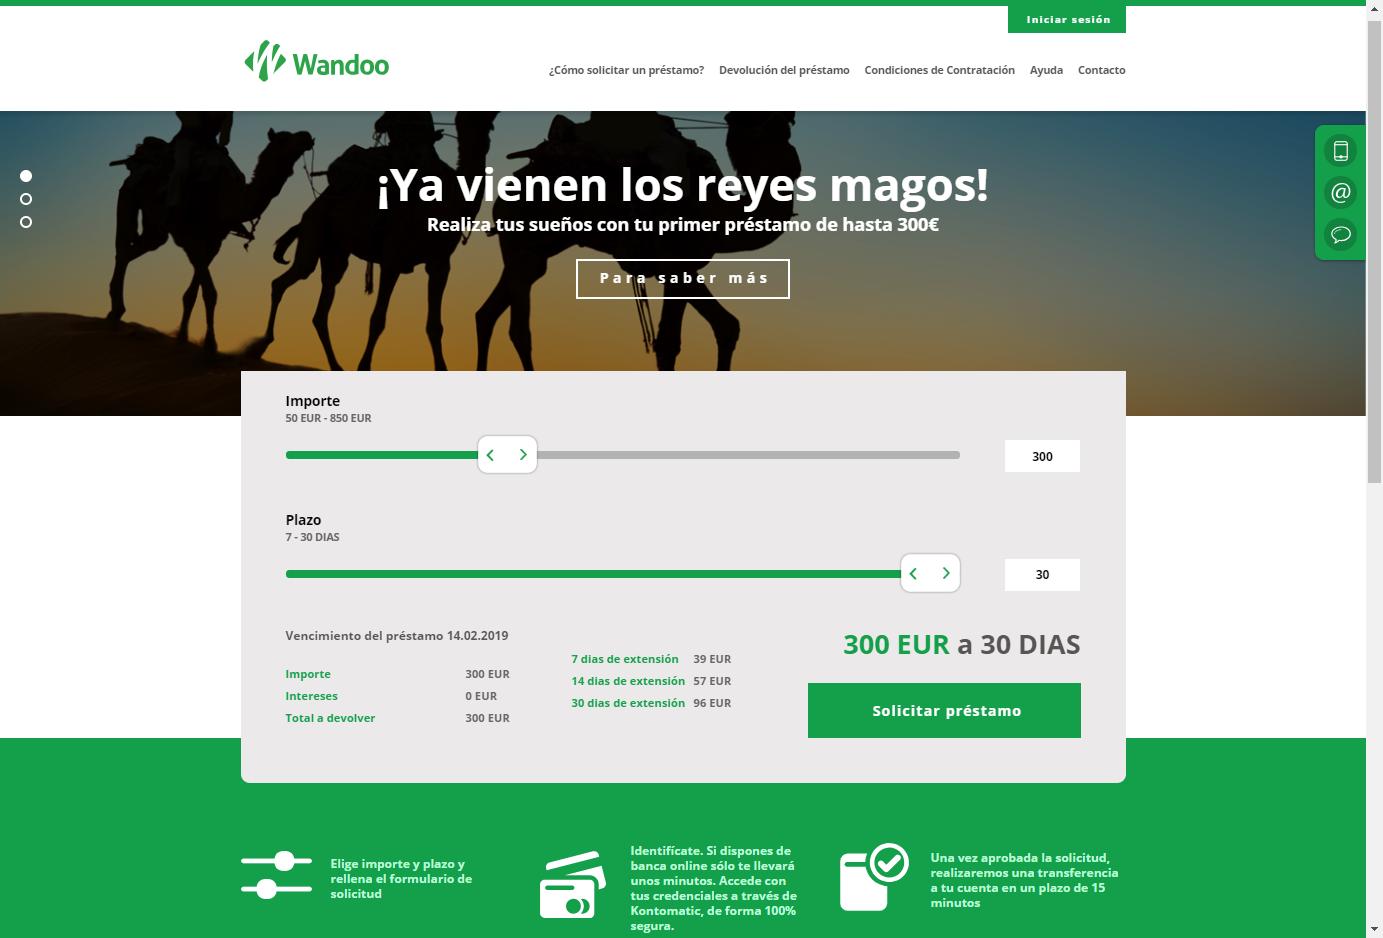 Wandoo créditos sitio web